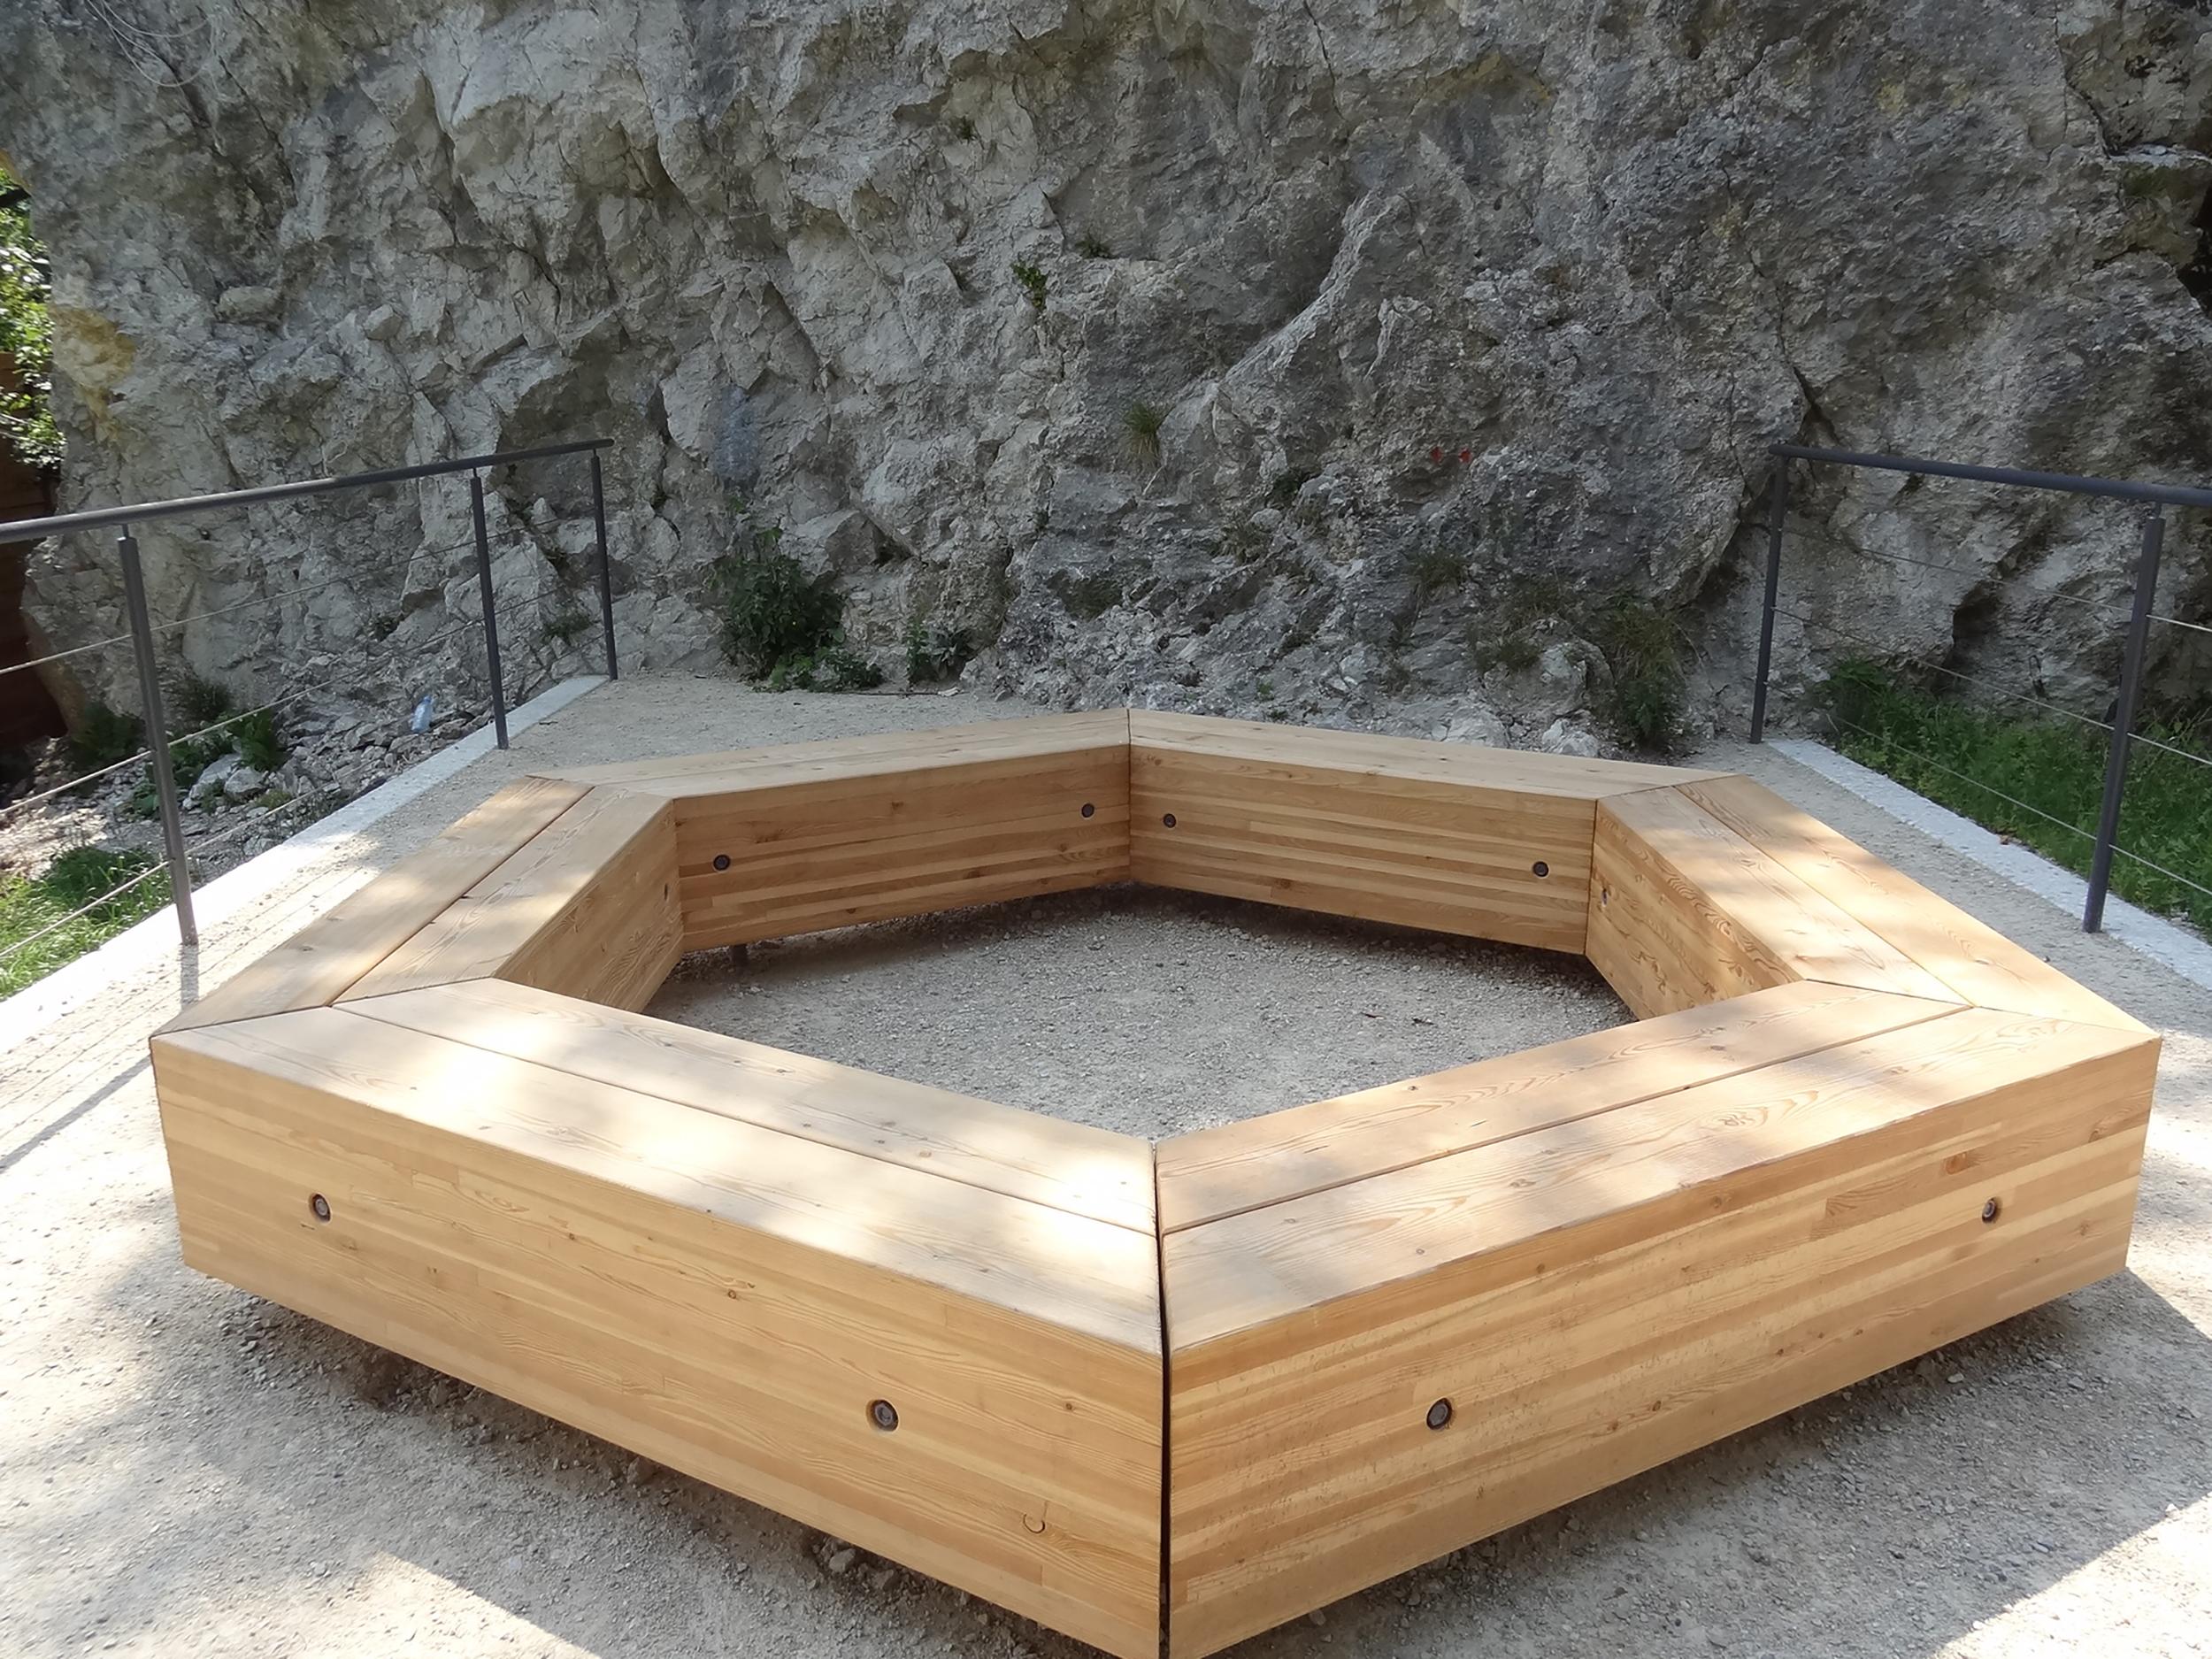 bruto design urbana oprema urban equipement masiven les macesen wood bench klop